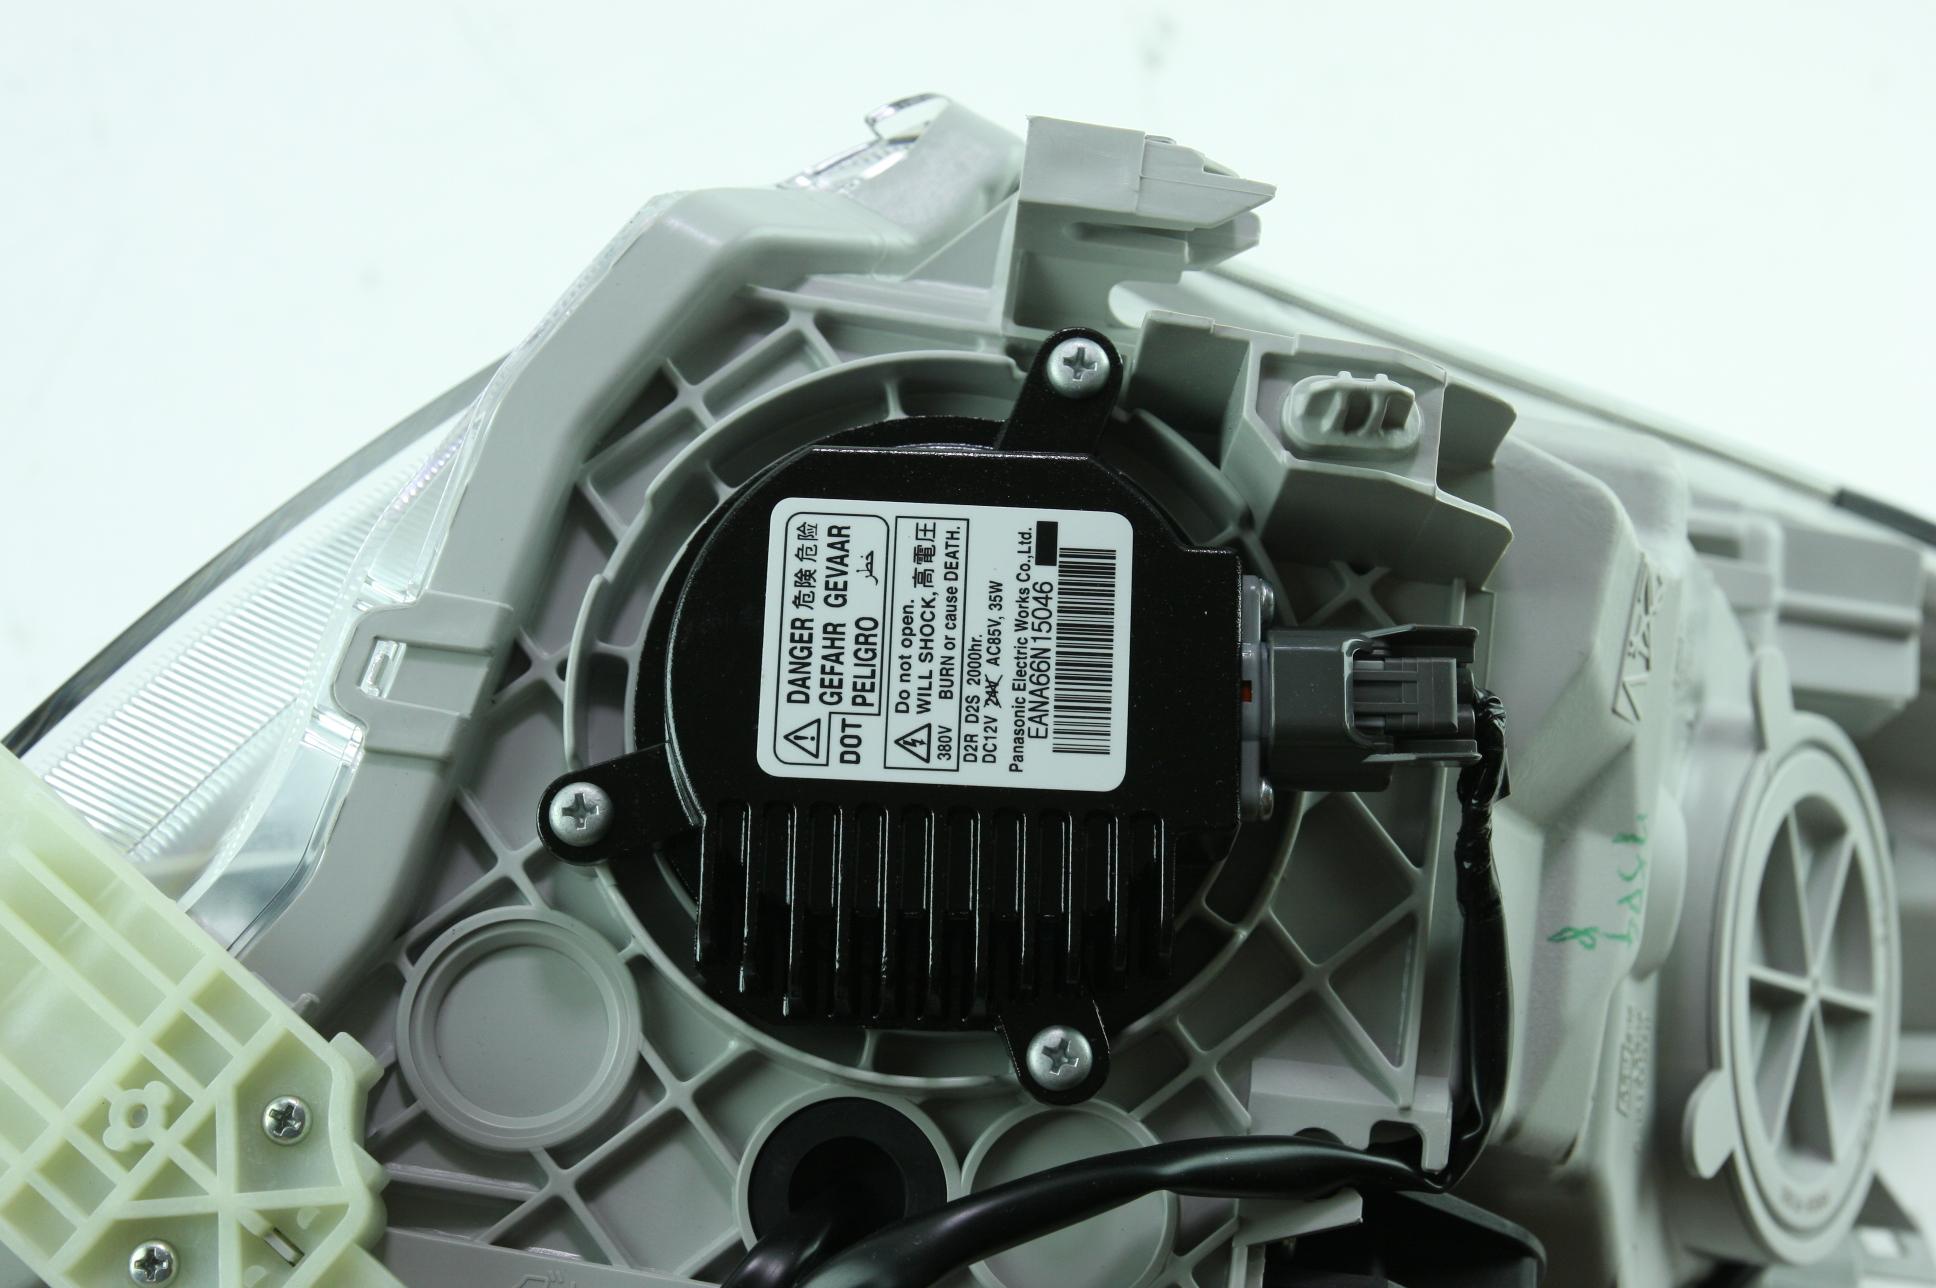 * Infiniti G37 Sedan Headlight LH Driver Side Genuine Nissan OEM 26060JK60E New - image 12